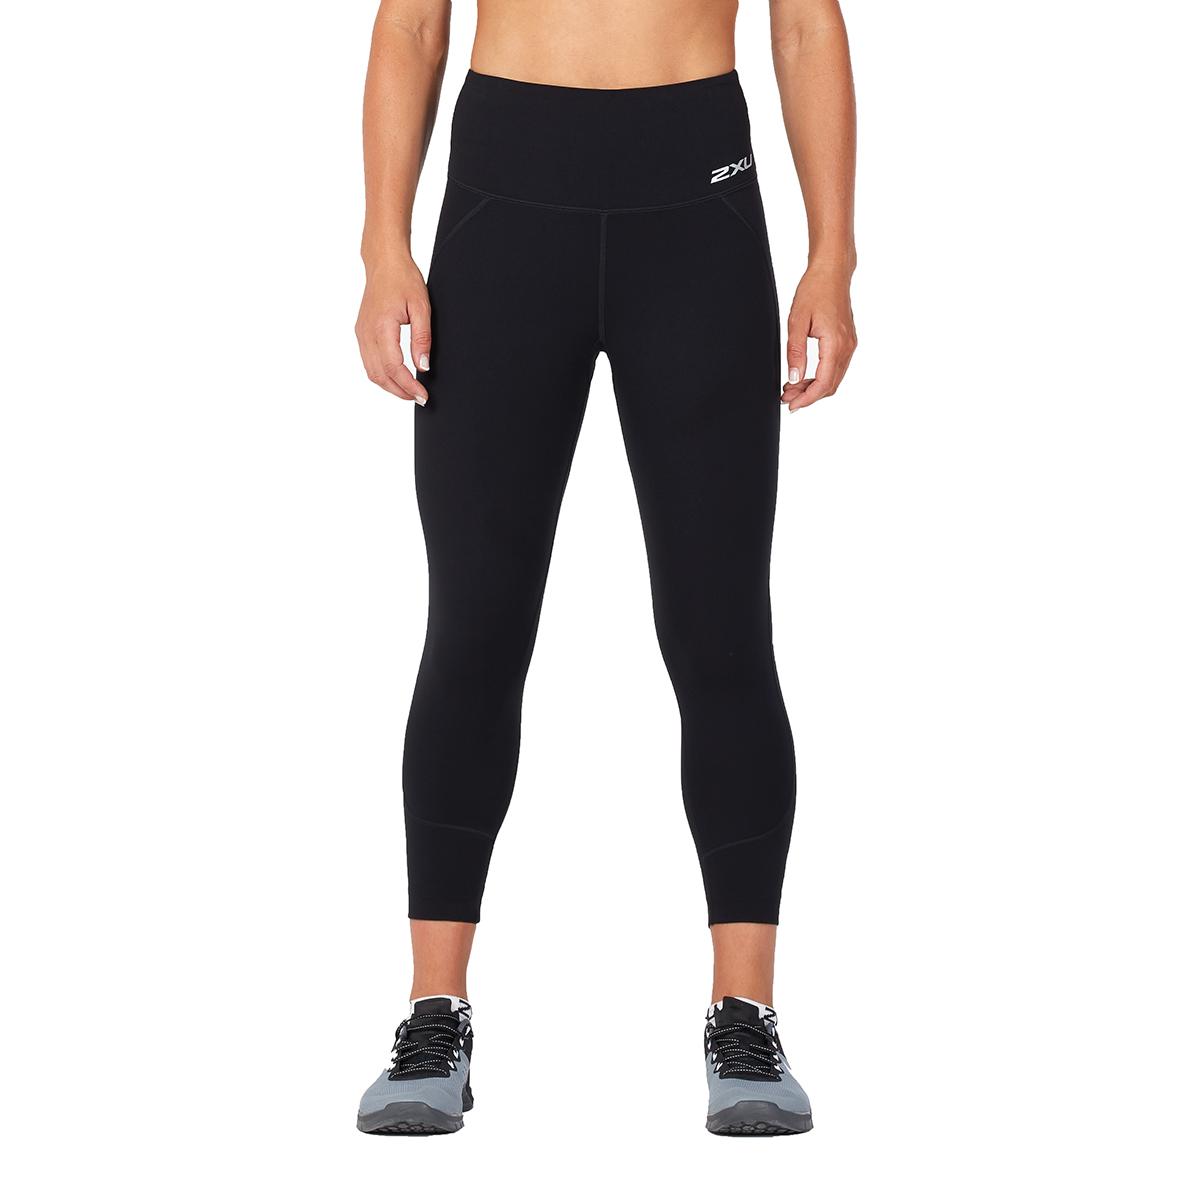 d69e9484e8 Details about 2XU Women's Fitness Hi-Rise 7/8 Compression Tights Black/Black  XL